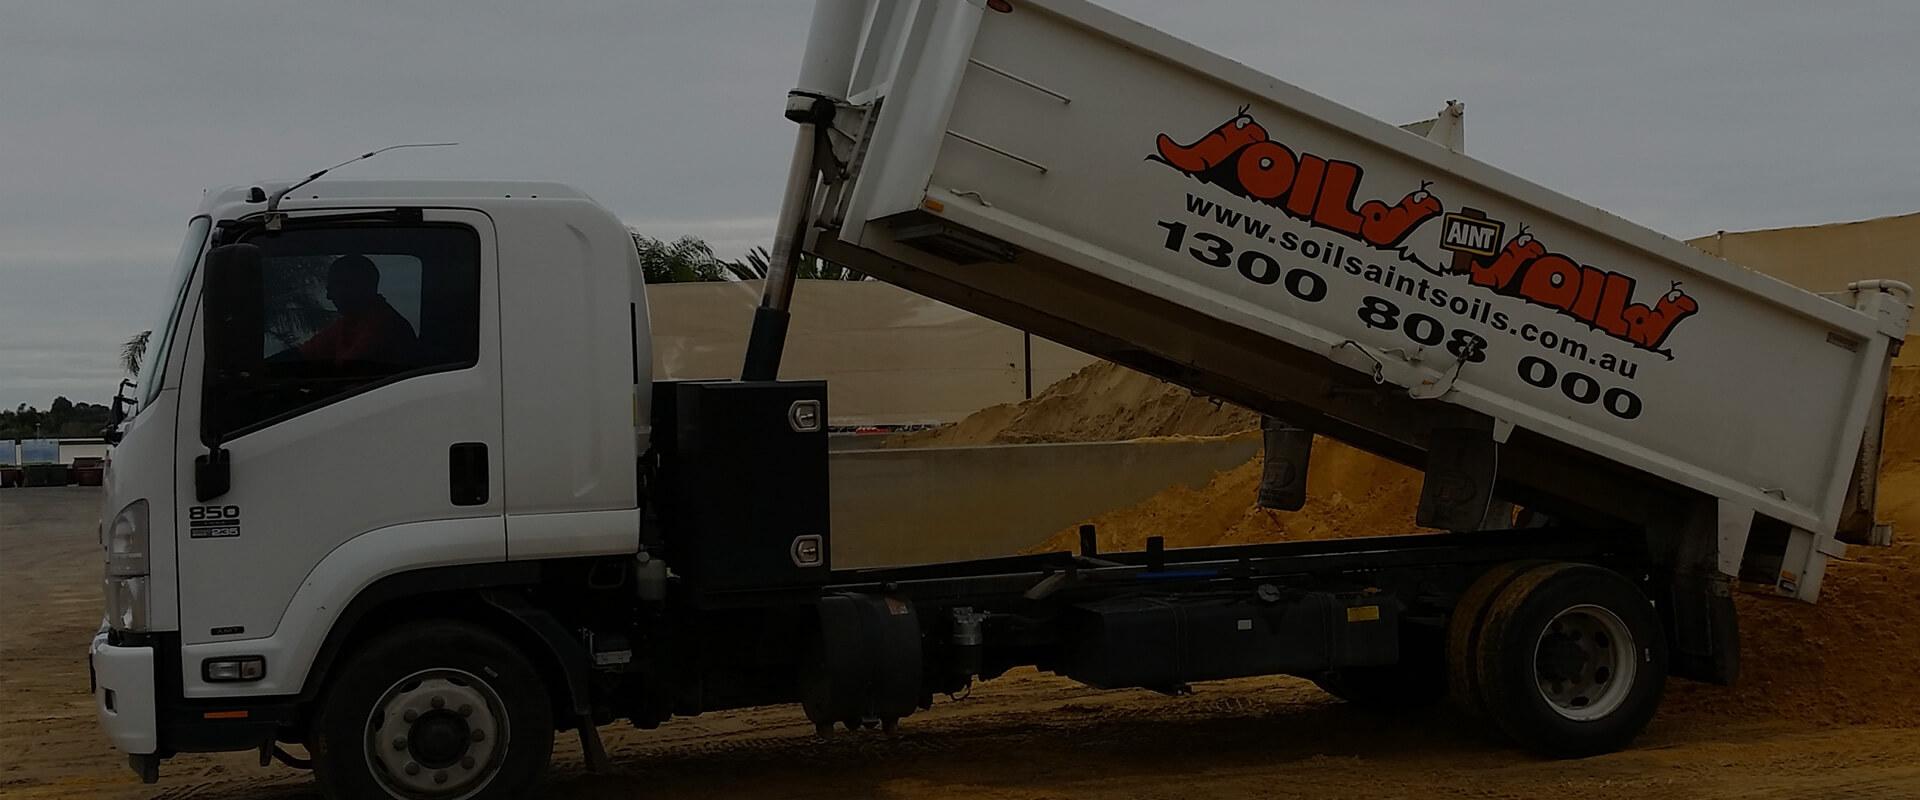 Soils Aint Soils Your Ultimate Soil Expert In Perth Wa Soils Aint